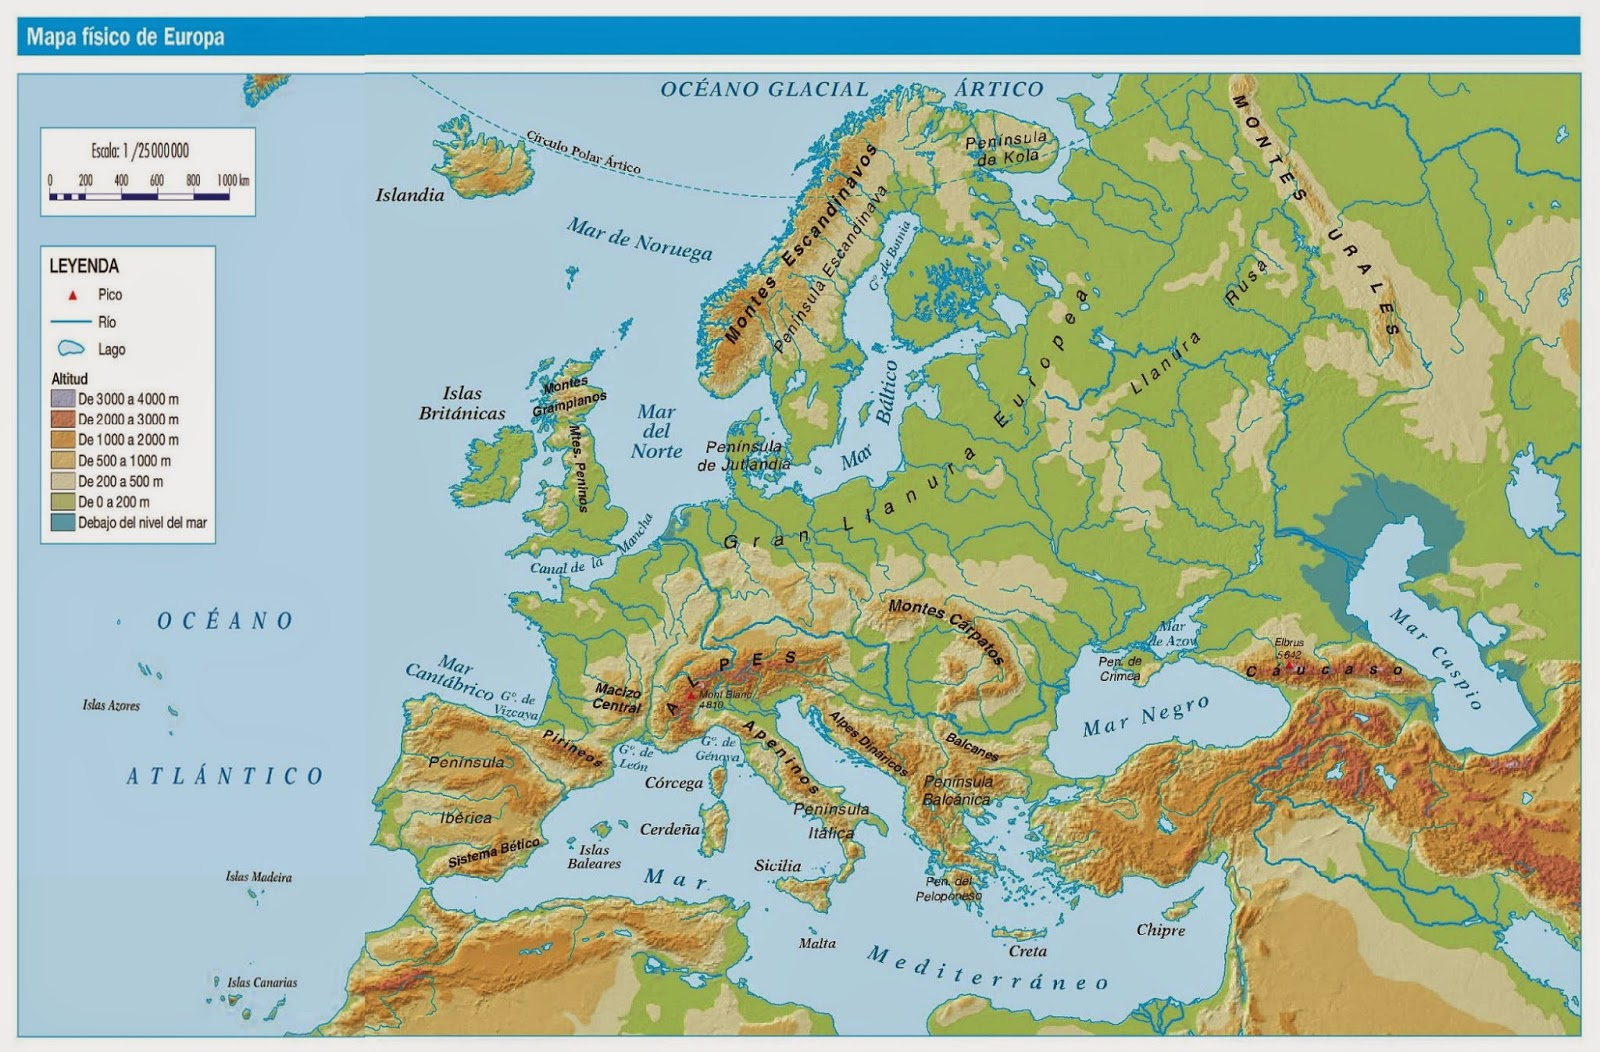 mapa europa com escala COMPENSATORIA 2º ESO GEOGRAFÍA E HISTORIA: MAPA FÍSICO DE EUROPA mapa europa com escala